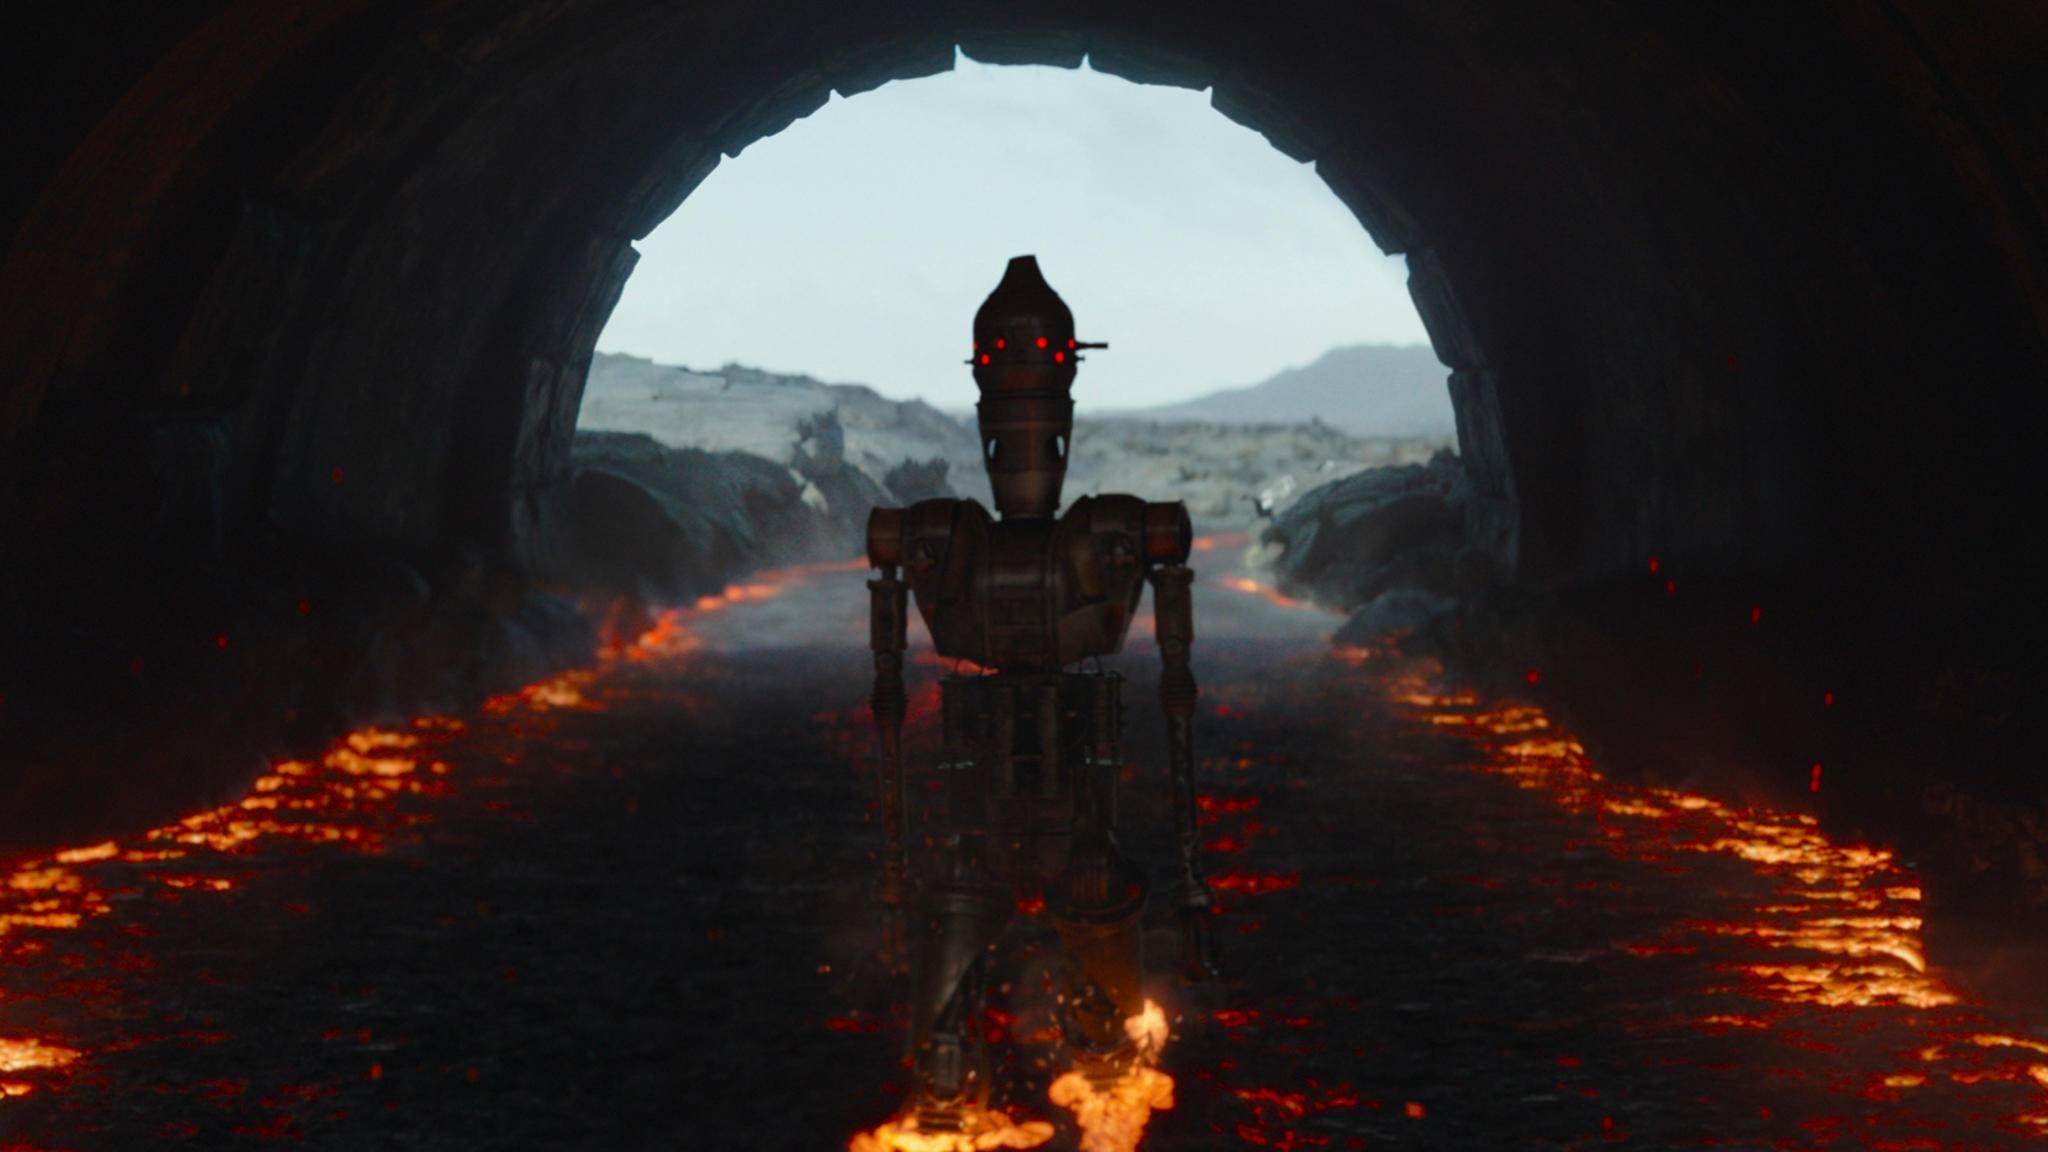 The Mandalorian IG-11 Taika Waititi S01E08